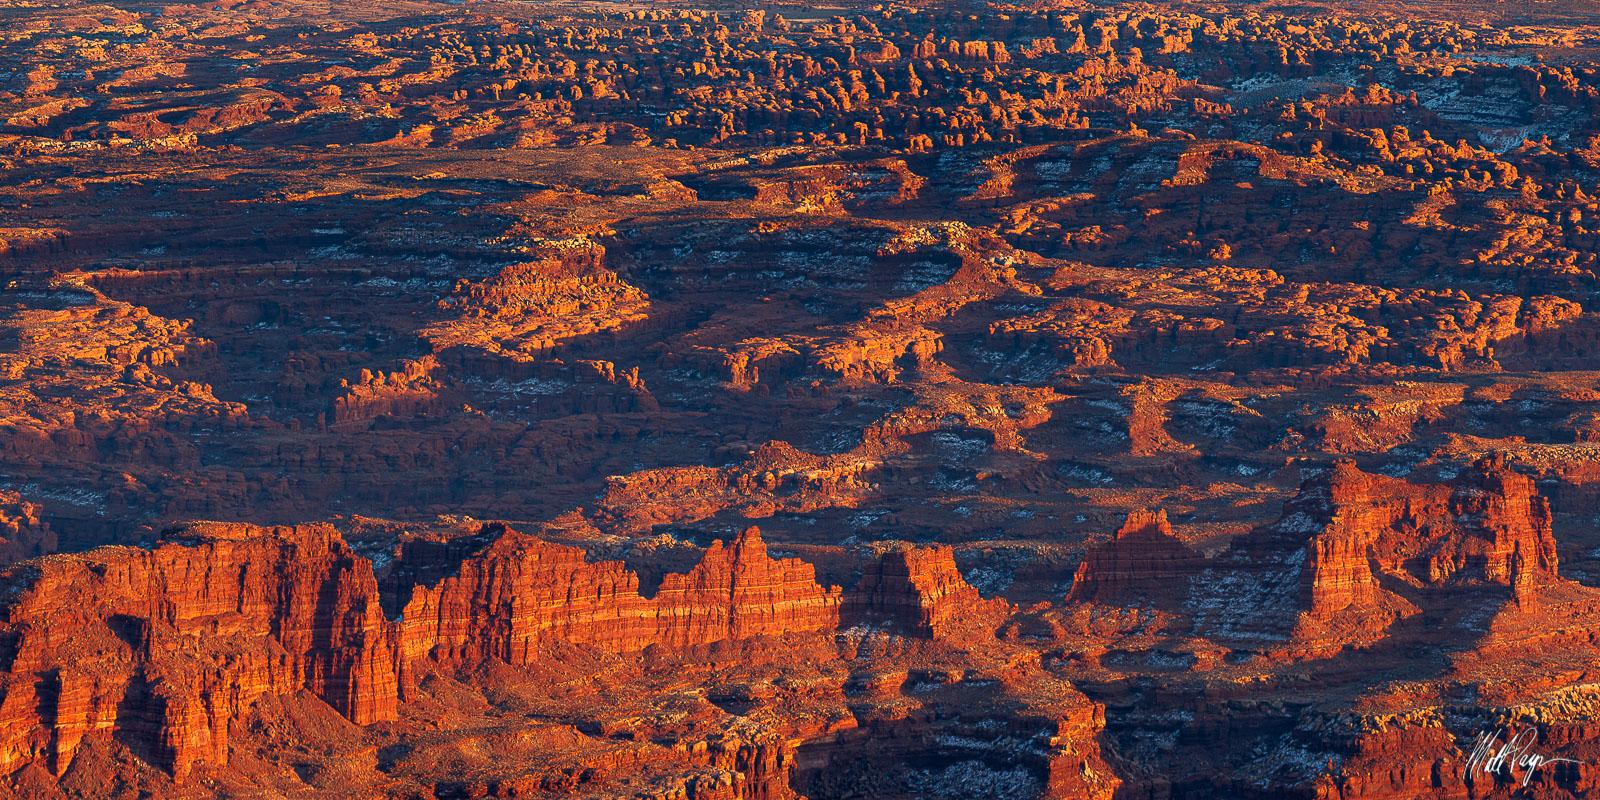 Canyonlands National Park, Erosion, Panorama, Panoramic, Sandstone, Snow, Utah, Vista, Winter, depth, desert, photo